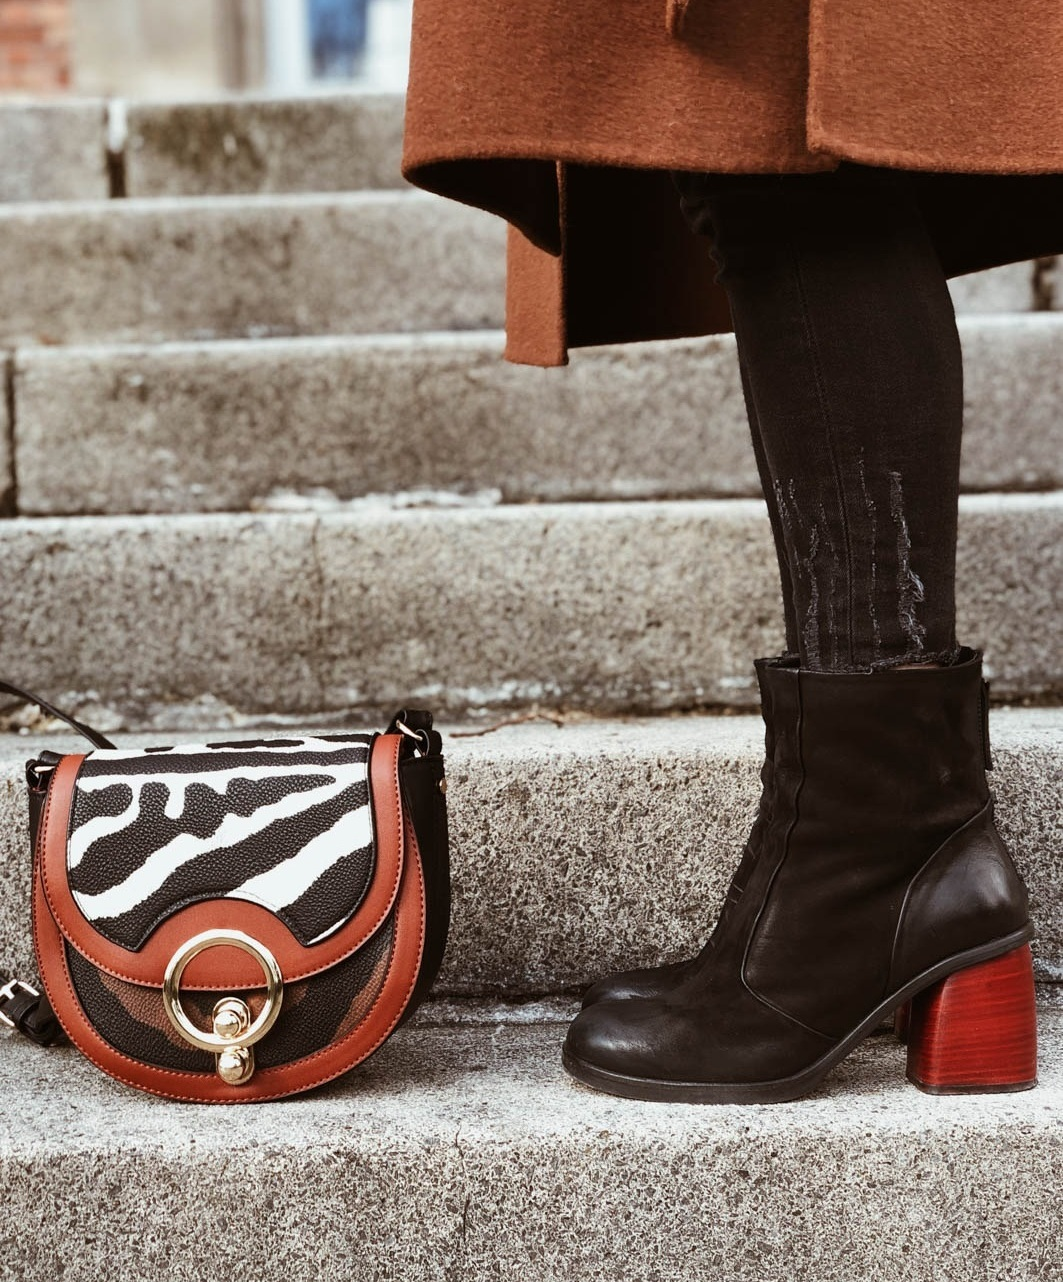 Carnet Sauvage - Blog mode femme, idée look rock et boho